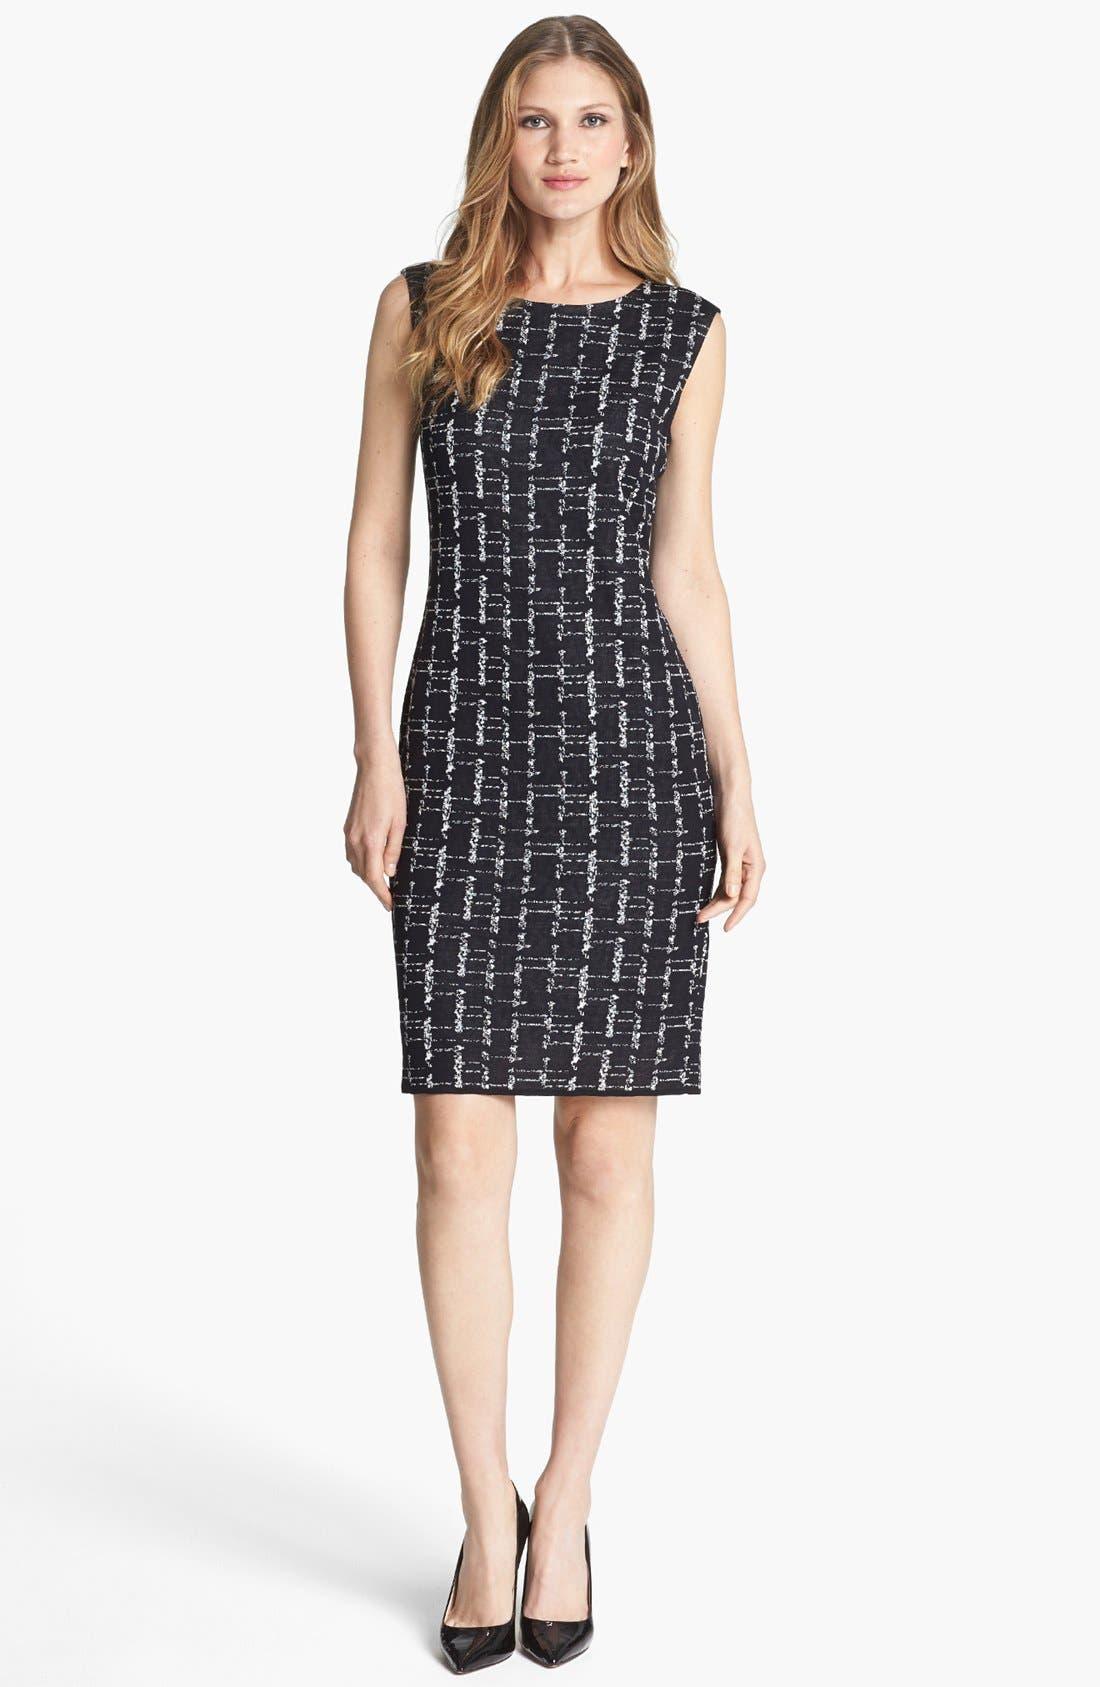 Alternate Image 1 Selected - Misook 'Judy' Sheath Dress